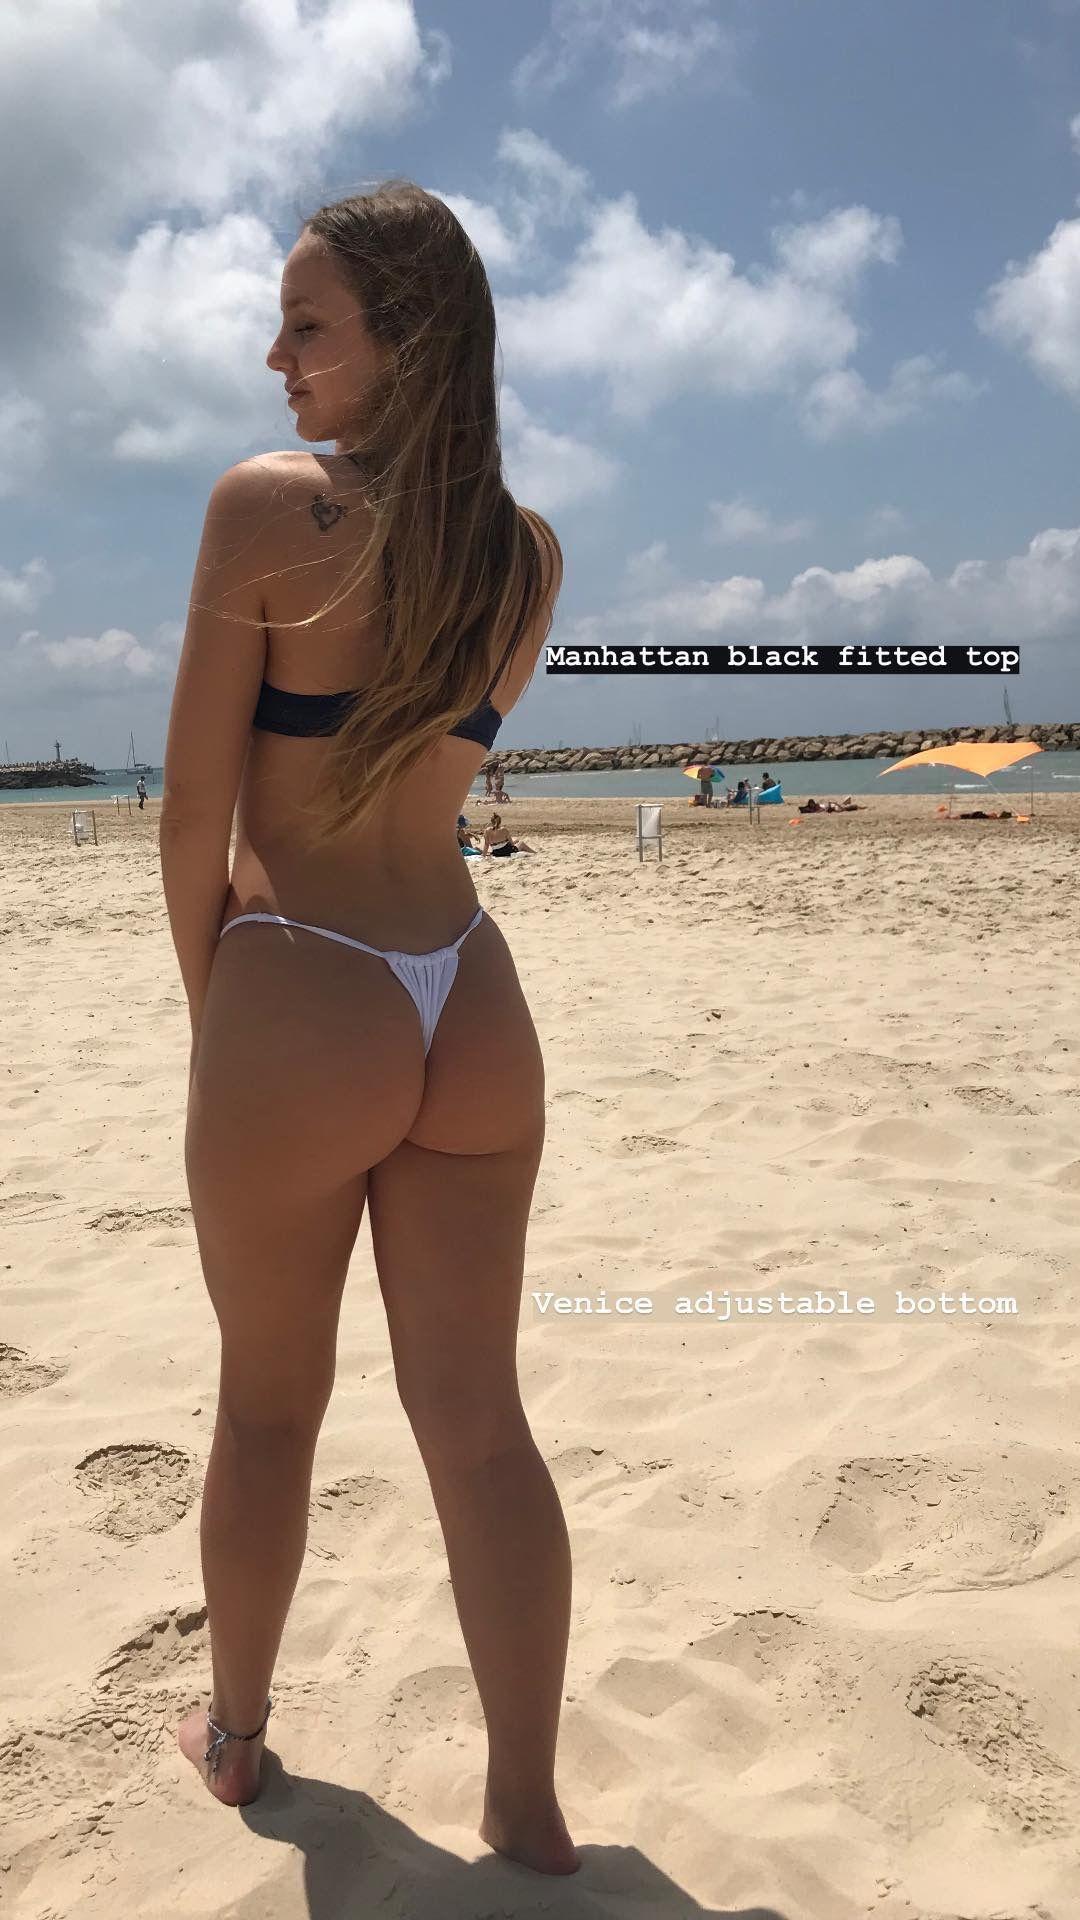 Images - Hot bikini butts penetrated